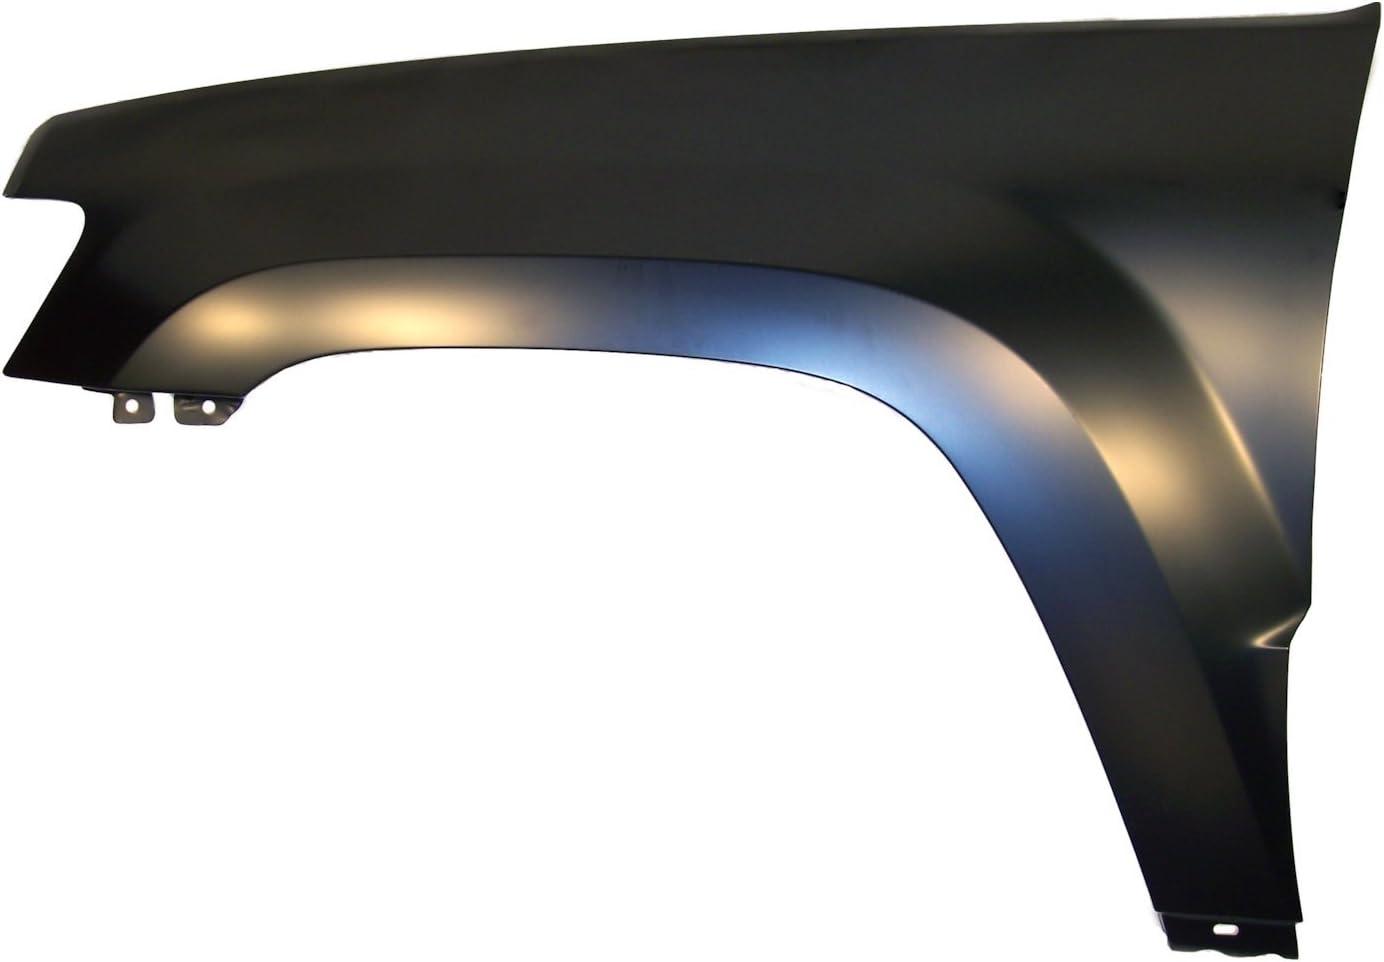 Left Crown Automotive 55013515 Wrangler Fender